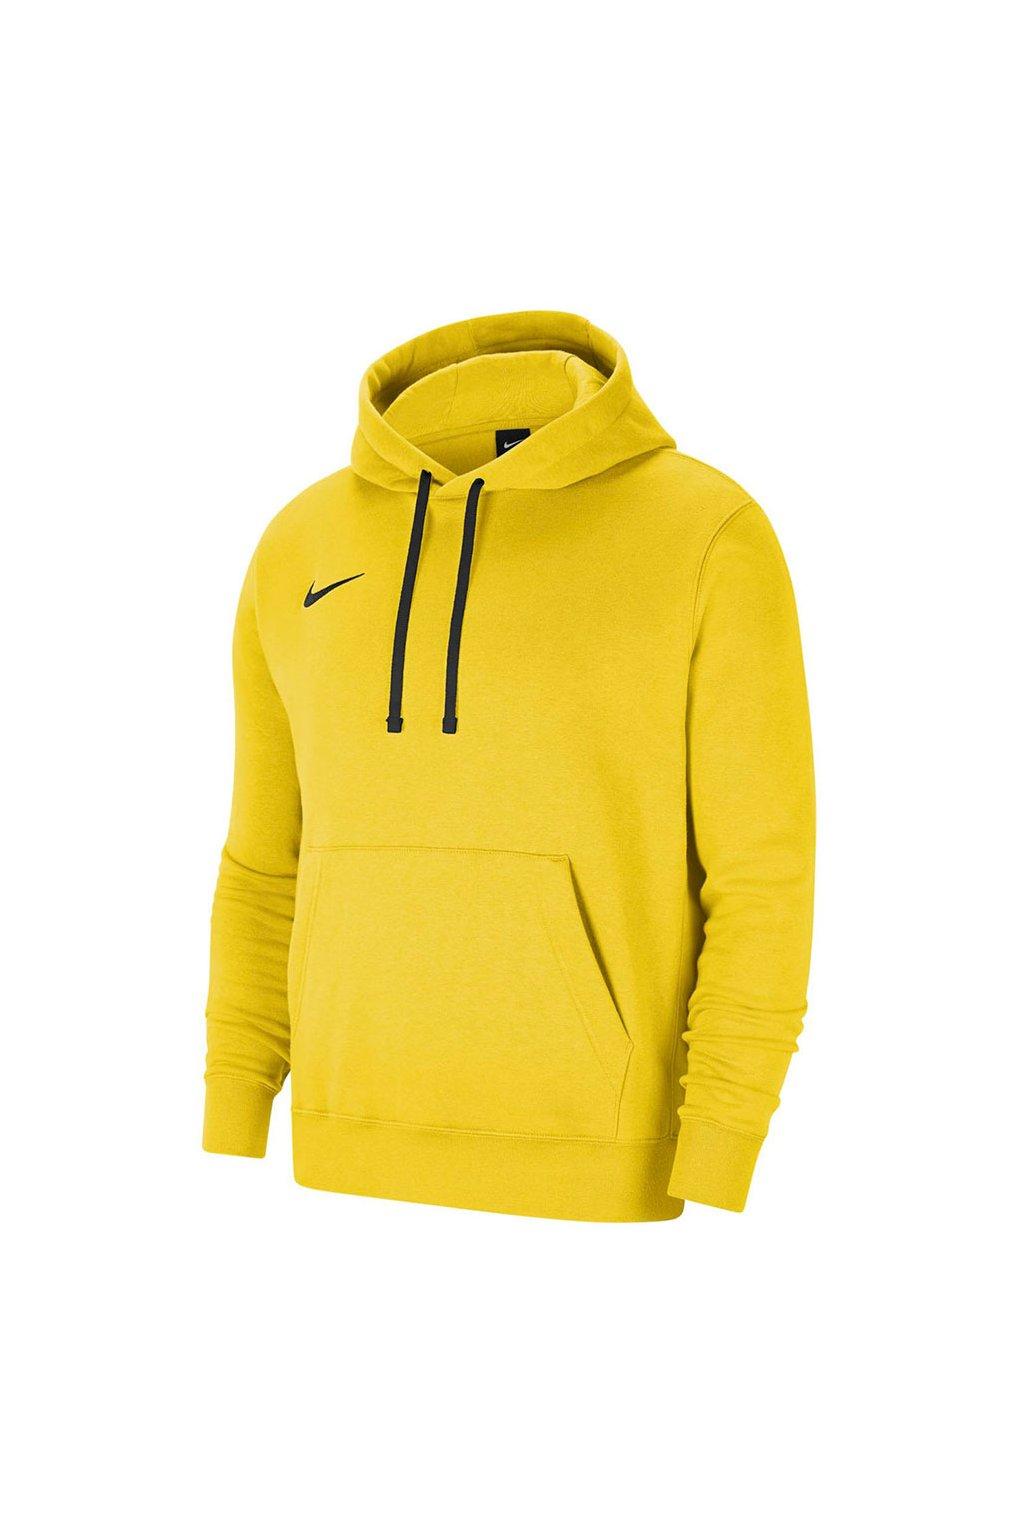 Dámska mikina Nike Park 20 Hoodie žltá CW6957 719